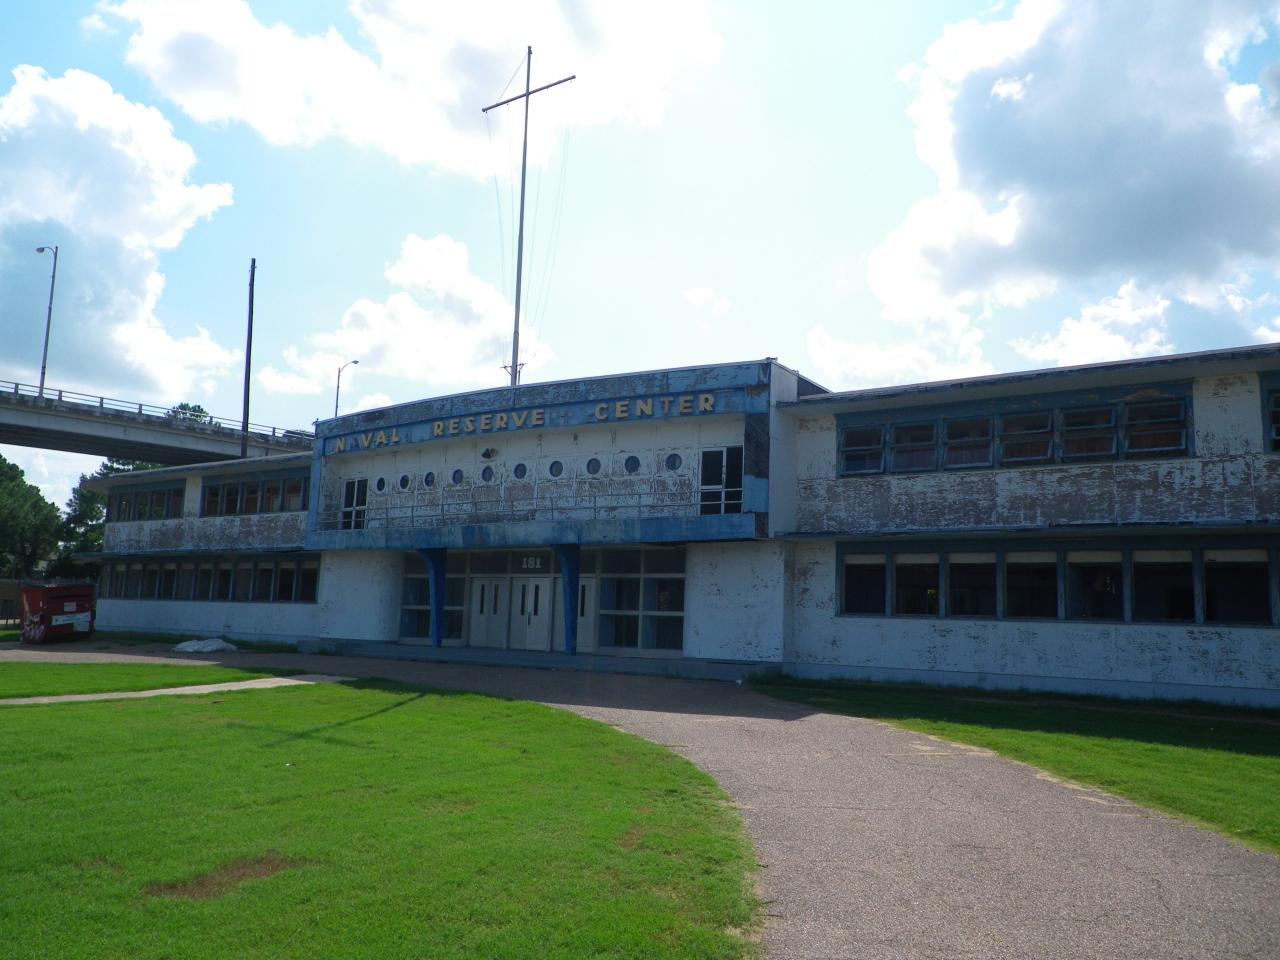 Naval Reserve Center